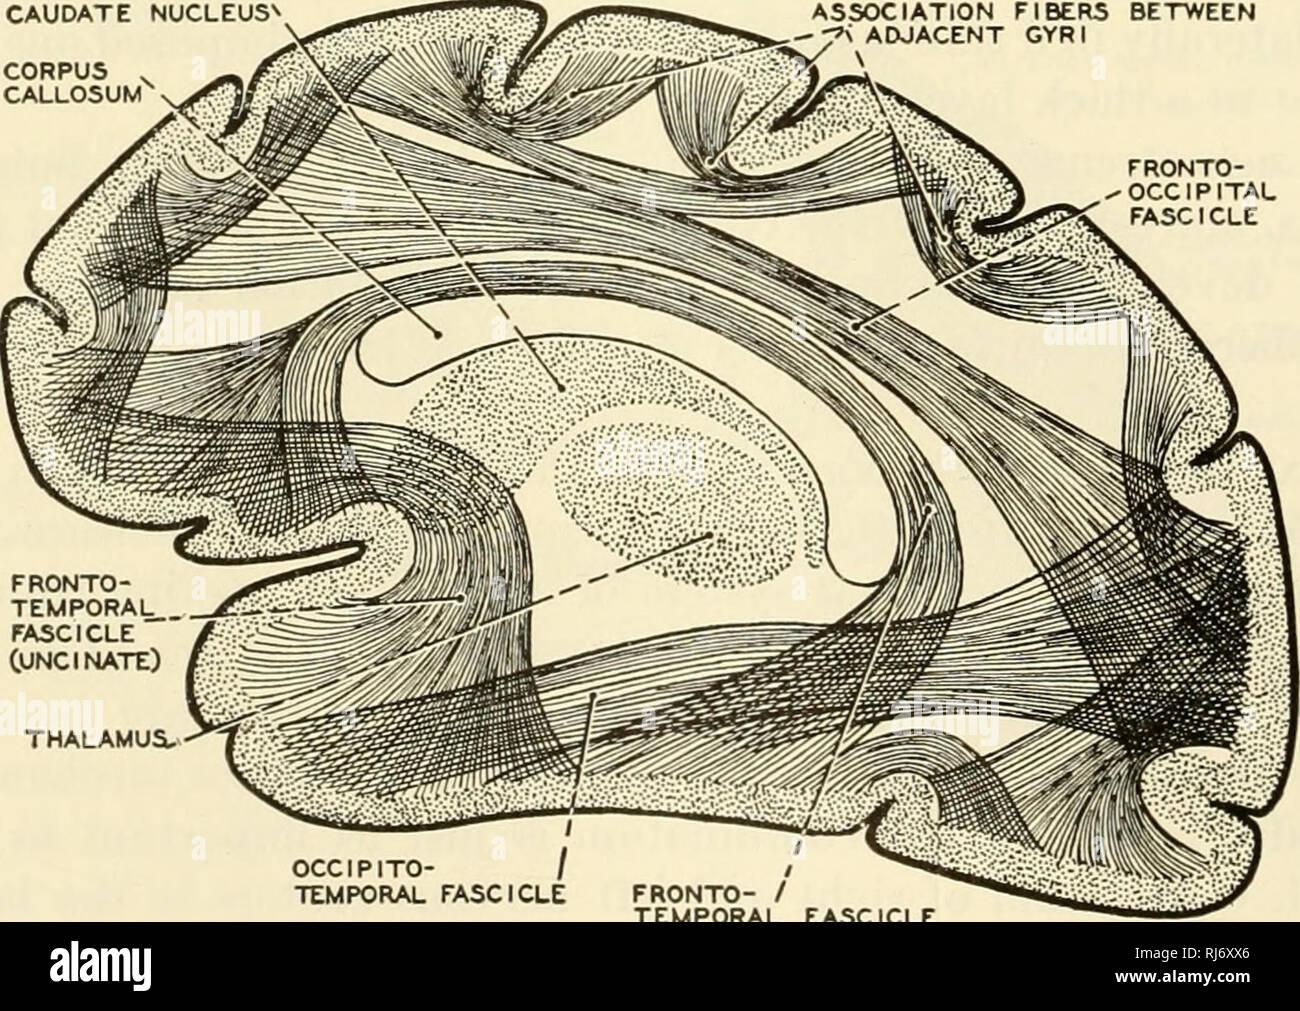 temporal lobe- occipital lobe •cerebellum ml dole peduncle nferior peduncle  fig  525  diagram